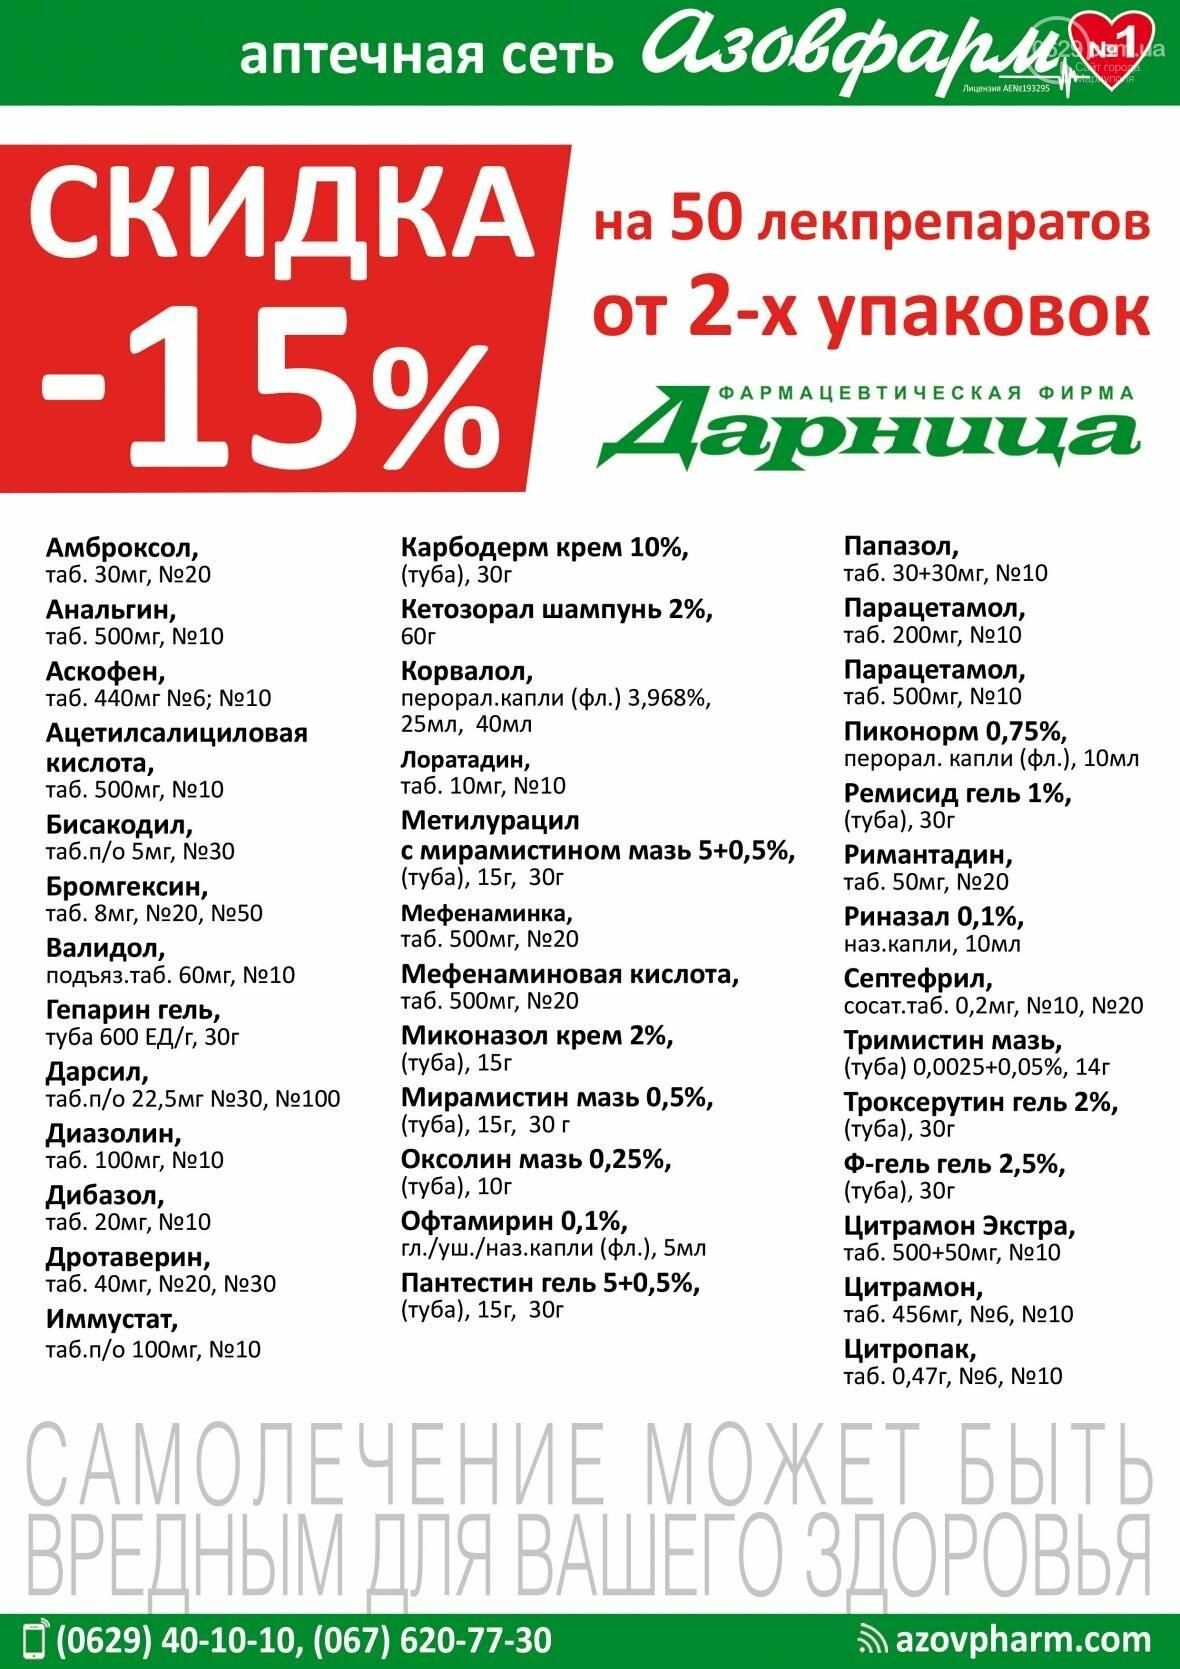 Жаркие скидки в аптеках «Азовфарм»!, фото-1